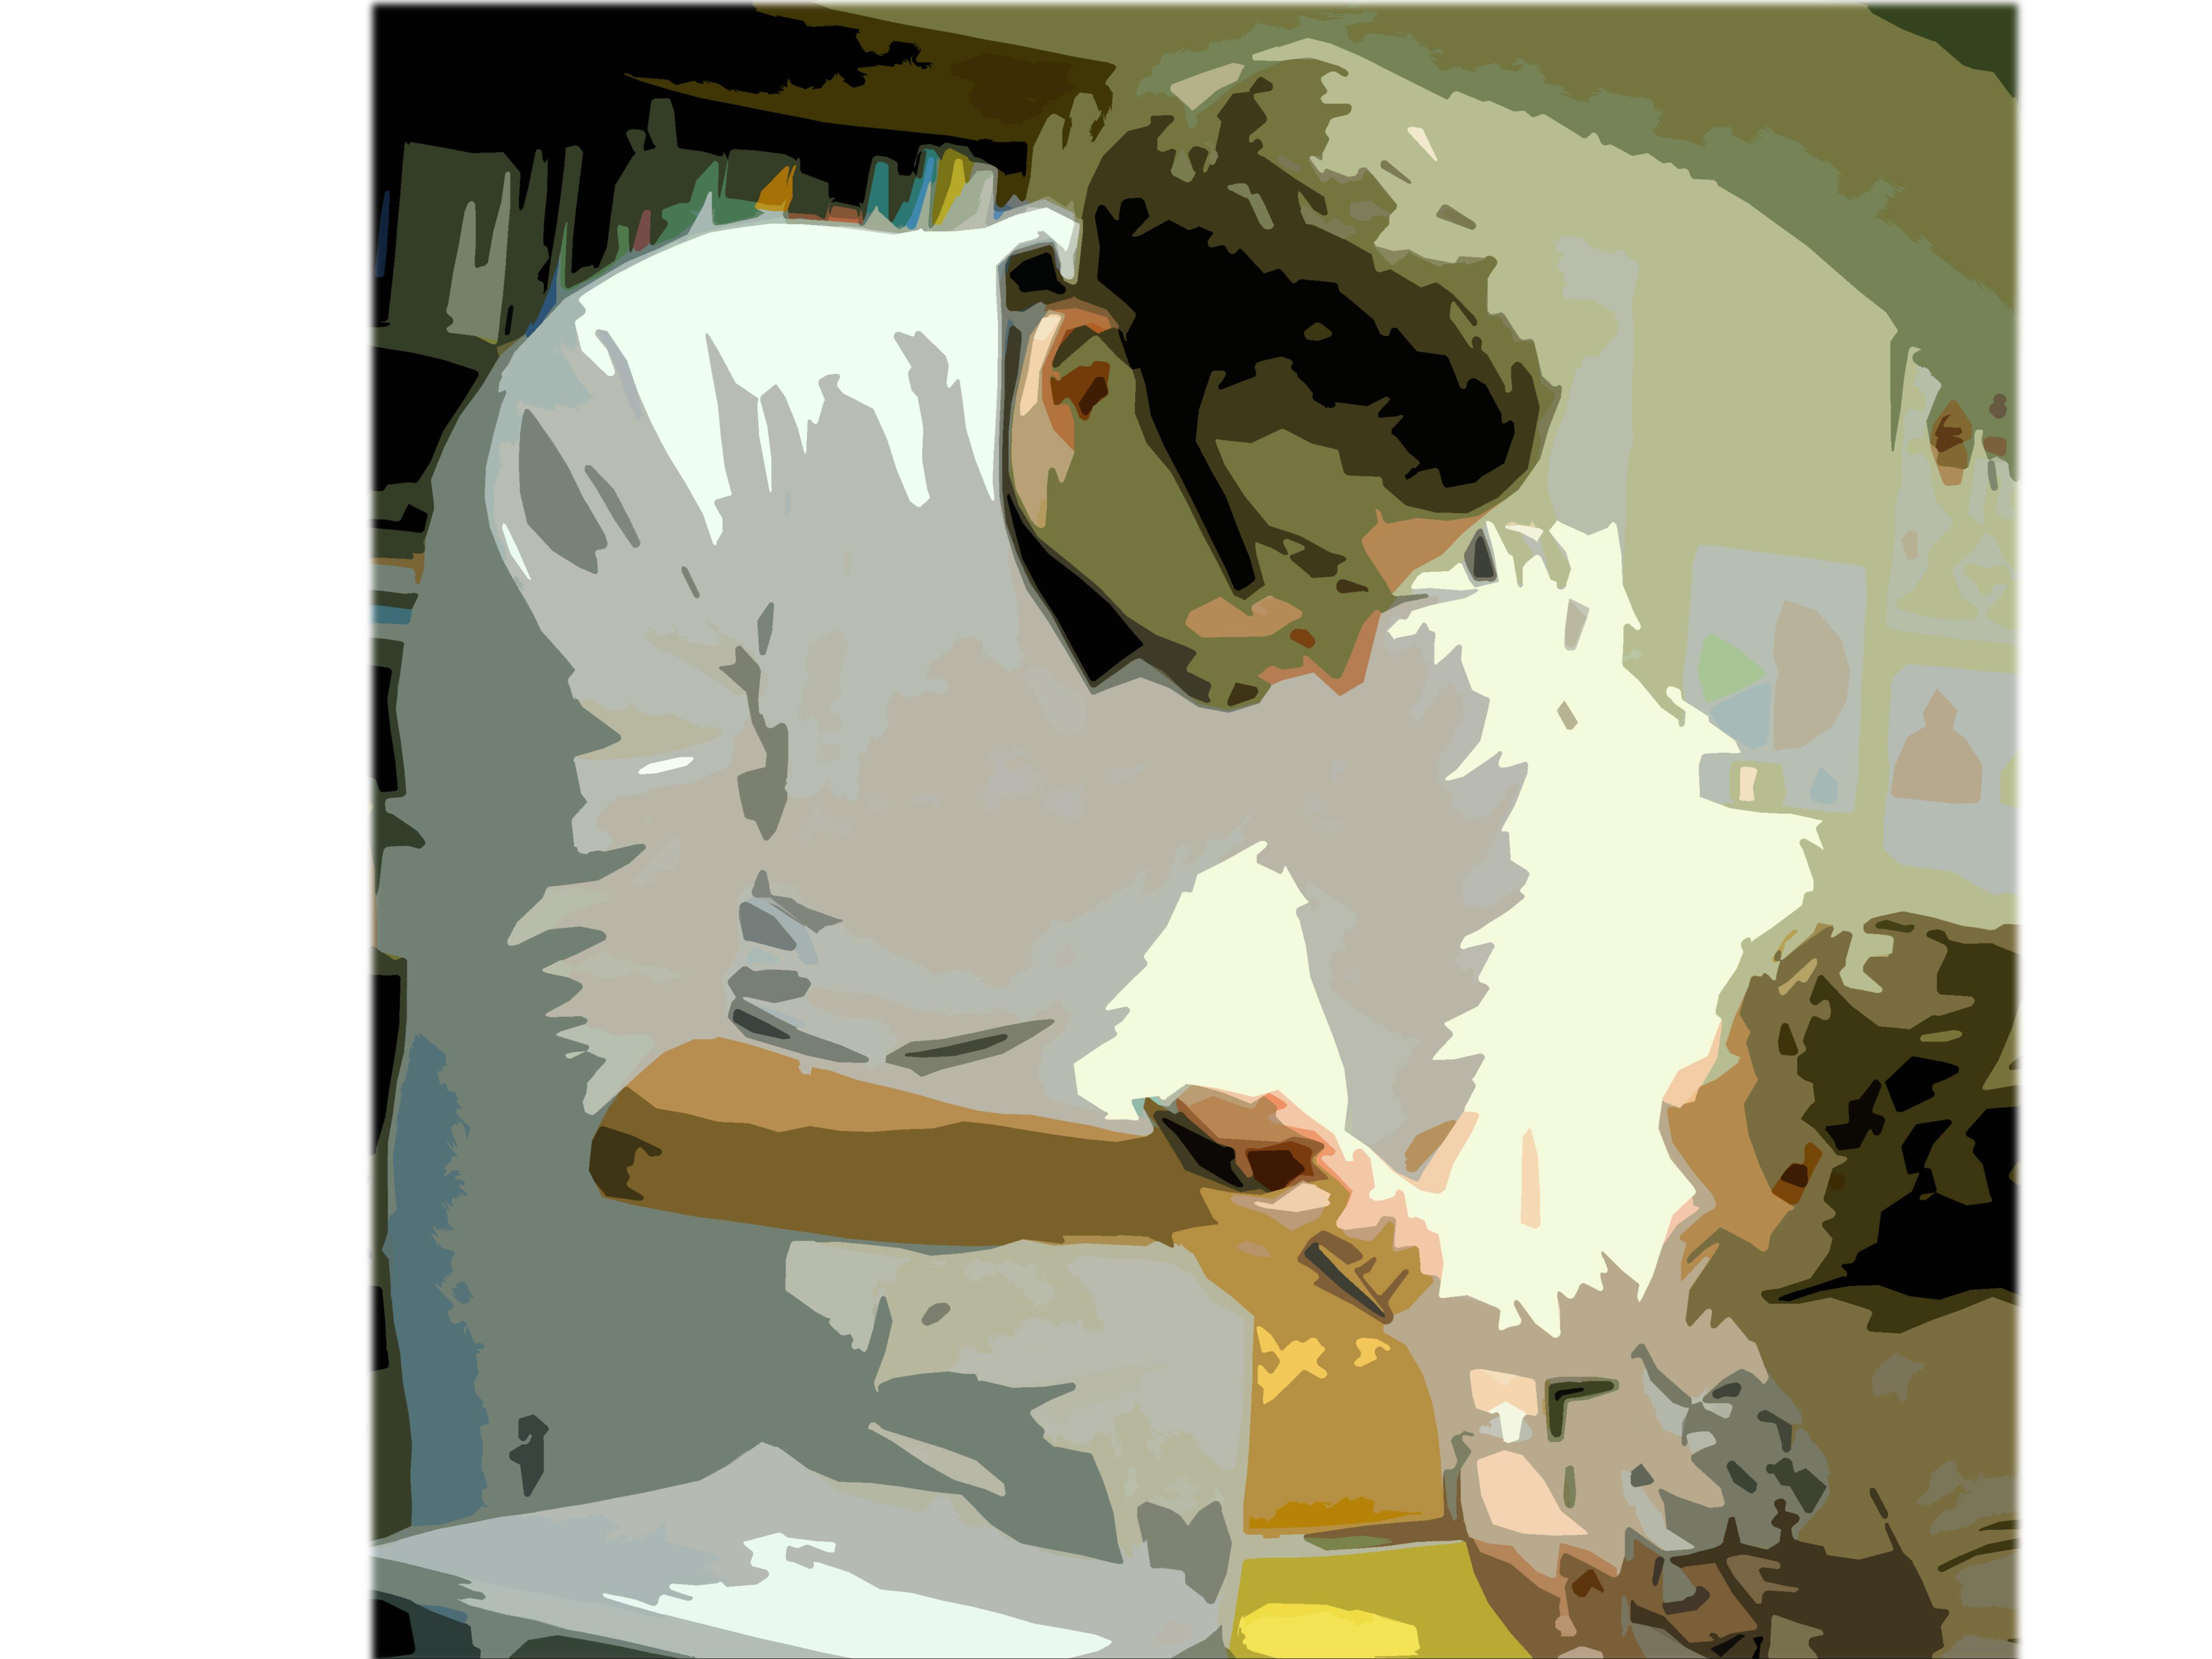 art-praxis-medicalpool-010.jpg